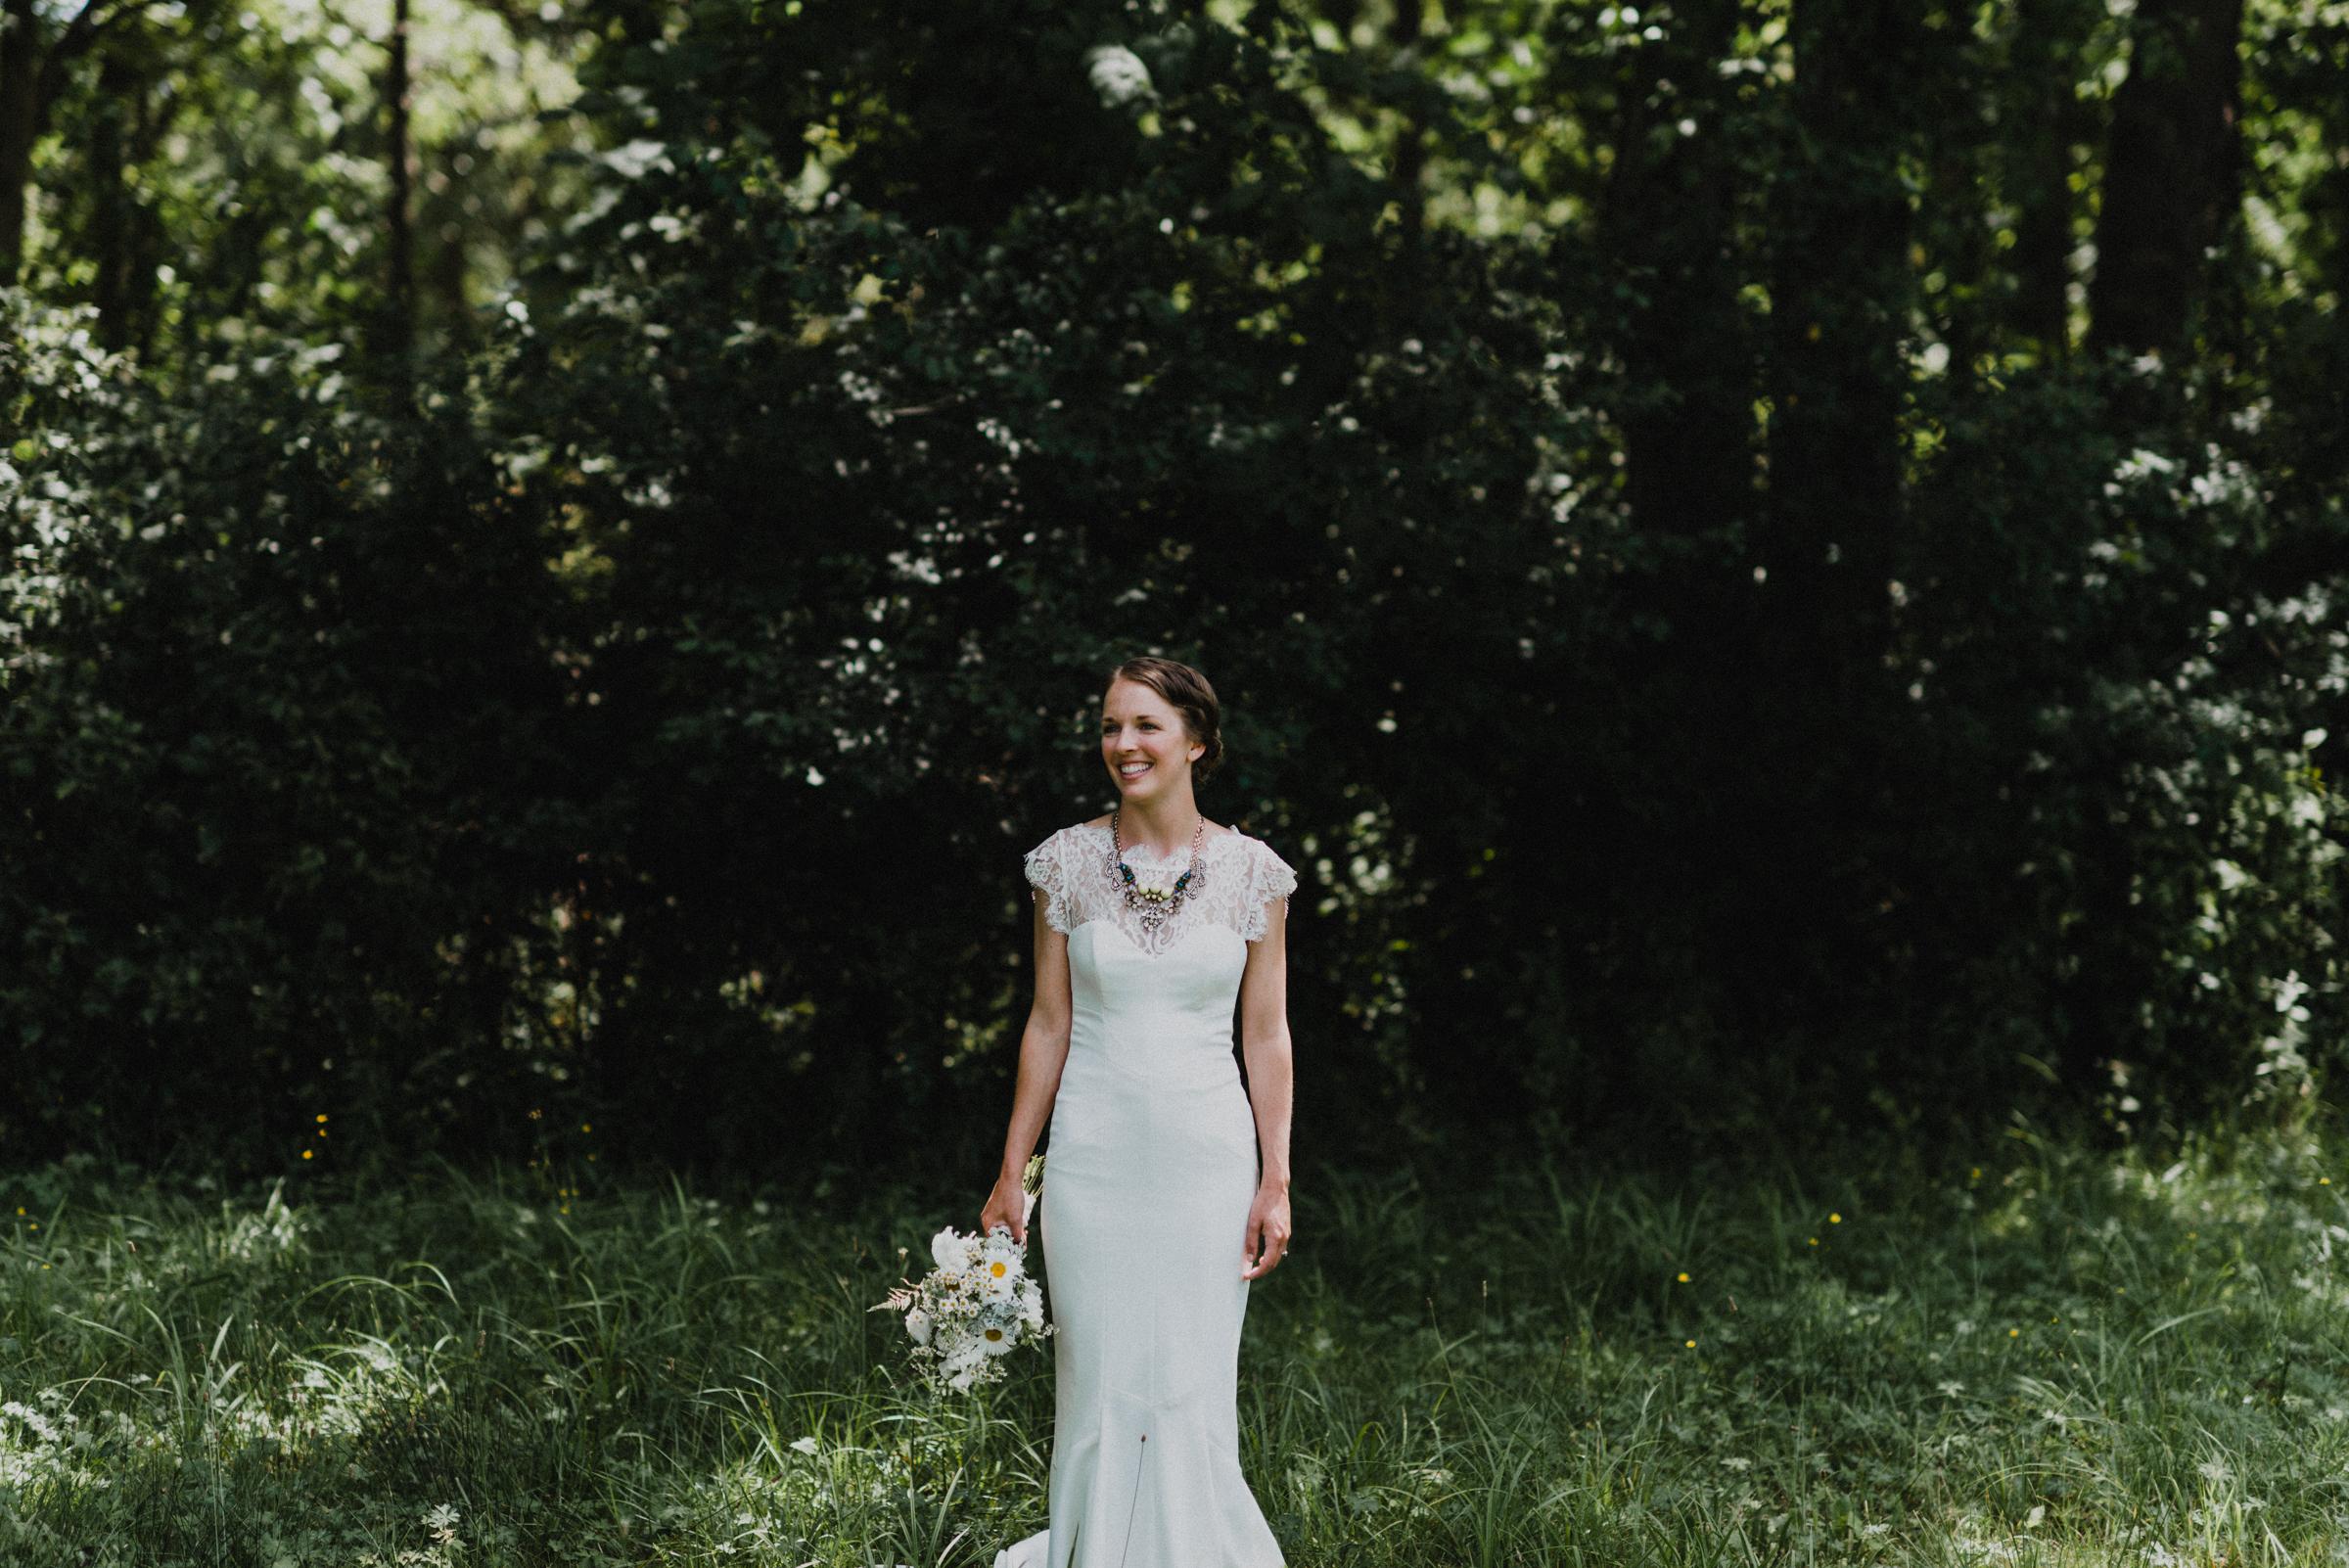 Intimate-Backyard-Farmhouse-Ohio-Wedding-Andi+Ben_Mallory+Justin-Photographers-93.JPG